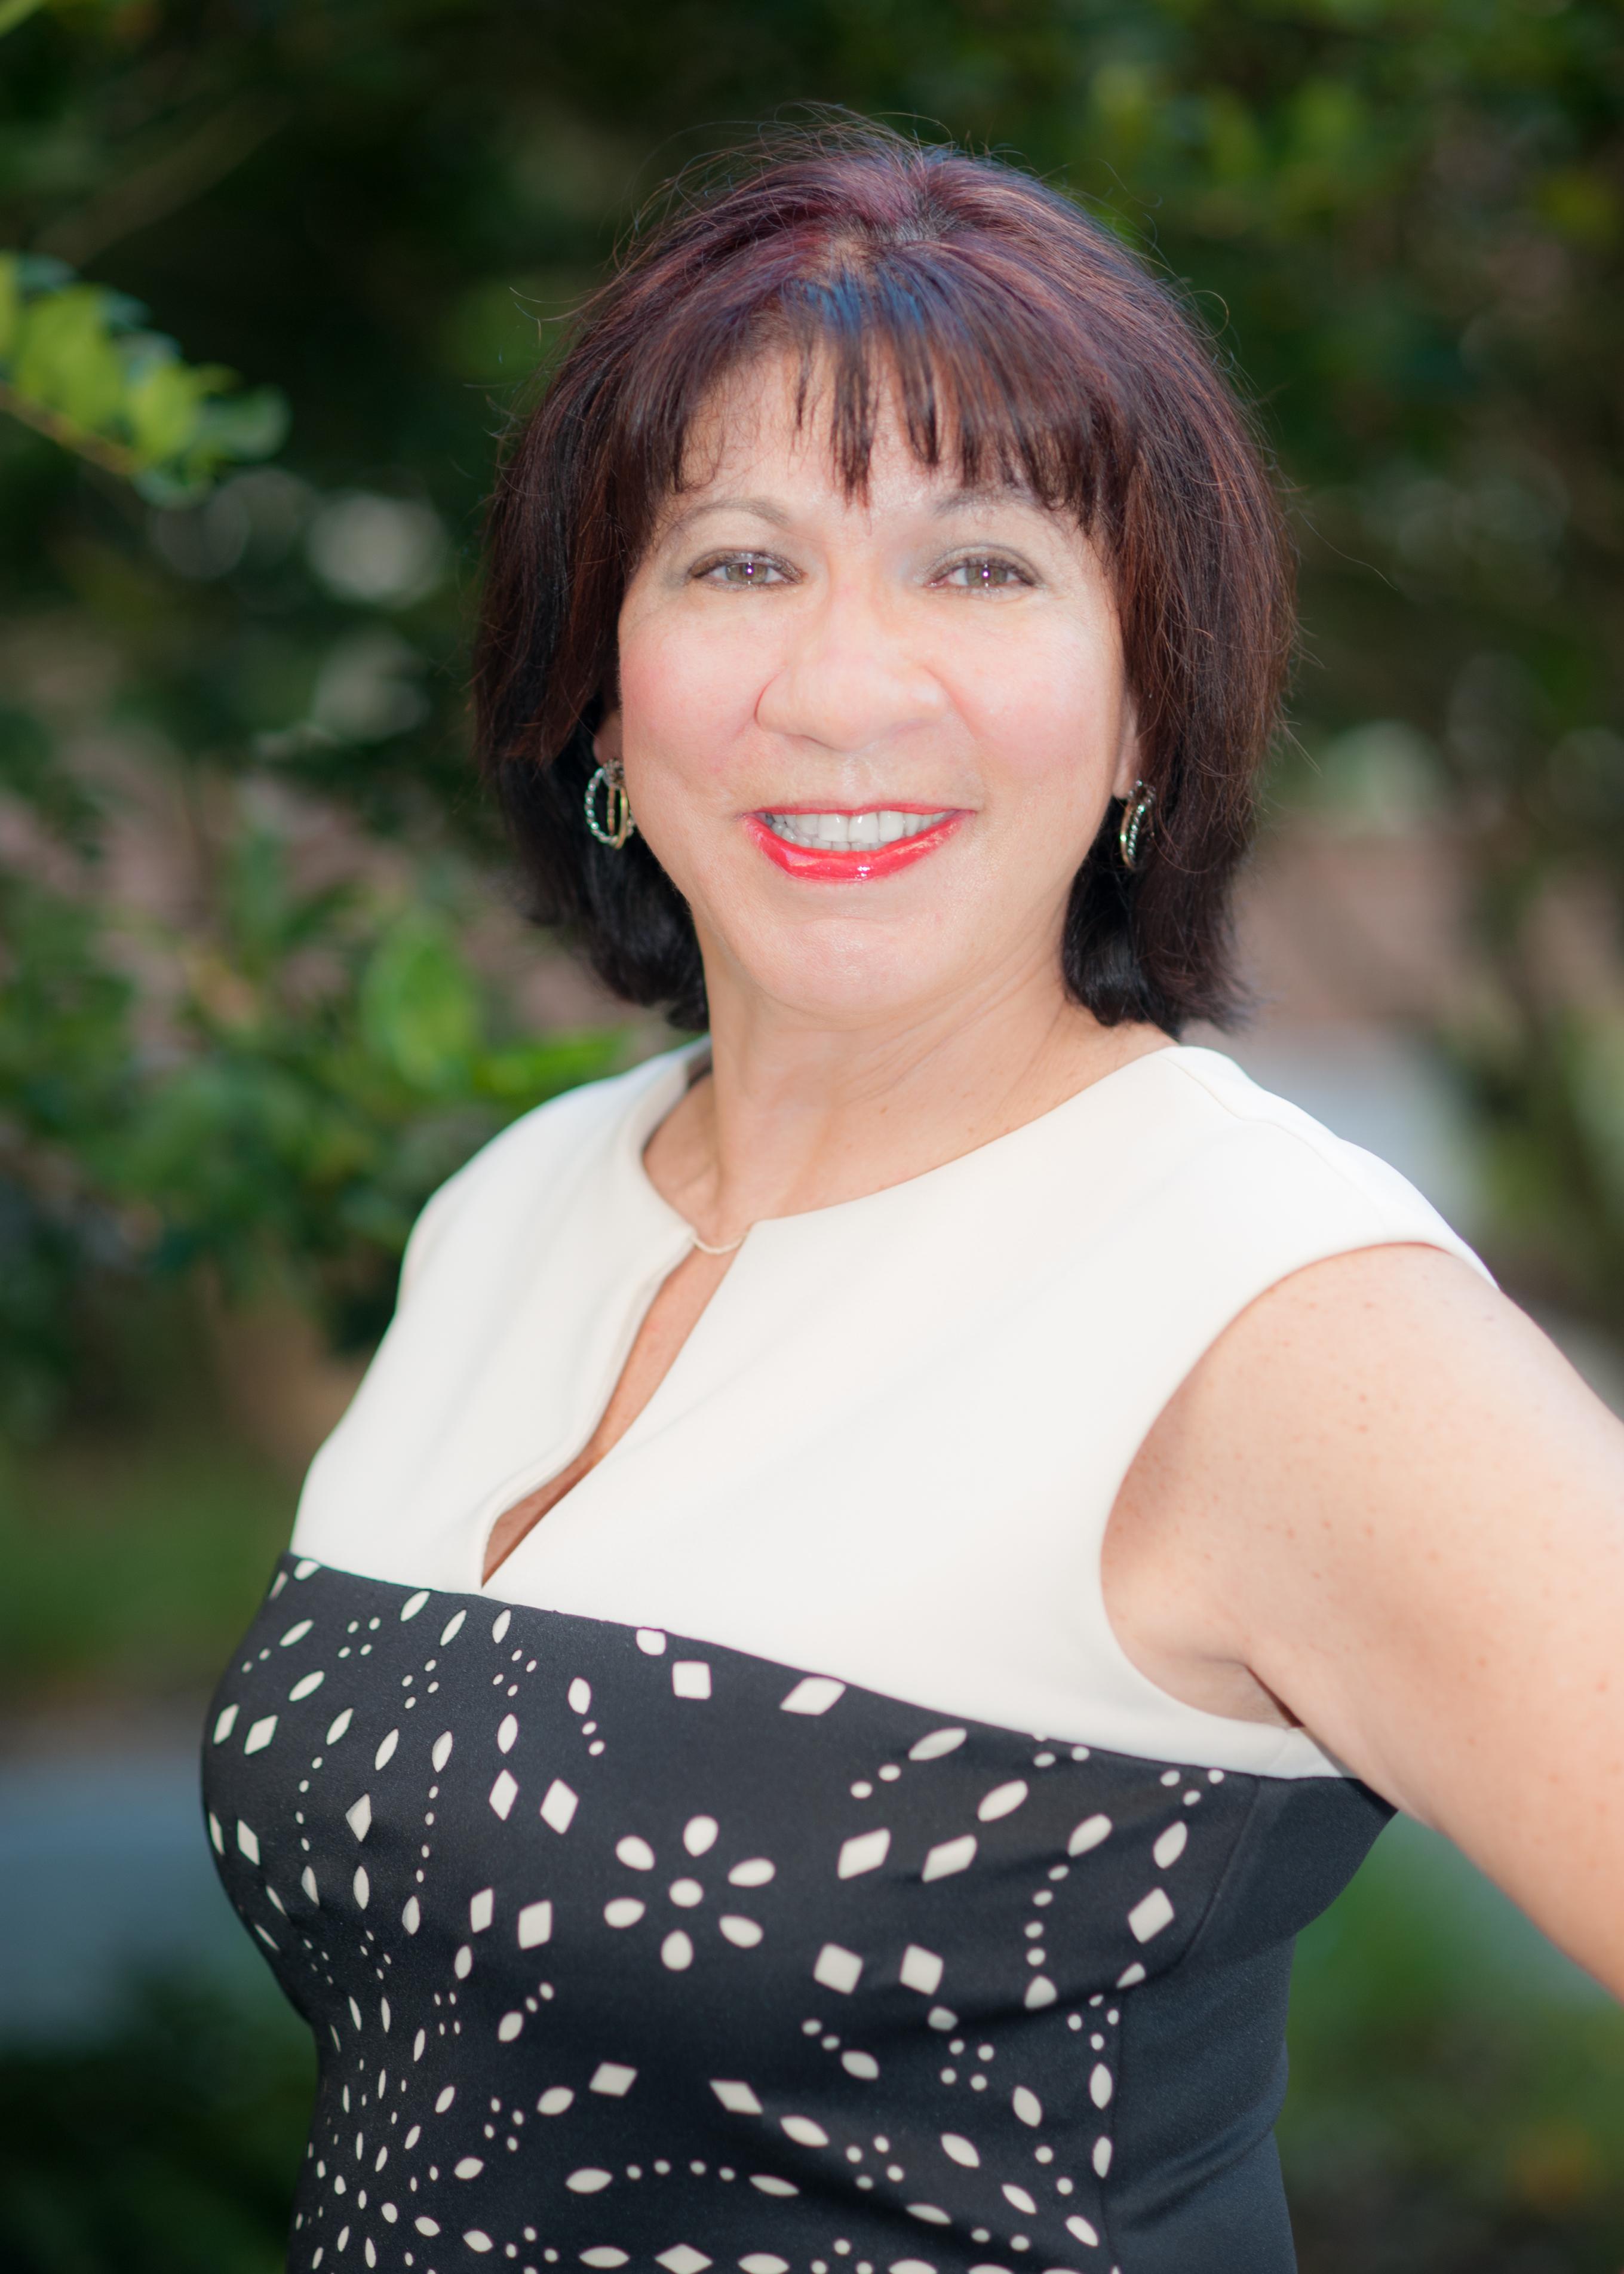 Linda Rosa-Lugo's profile picture at UCF